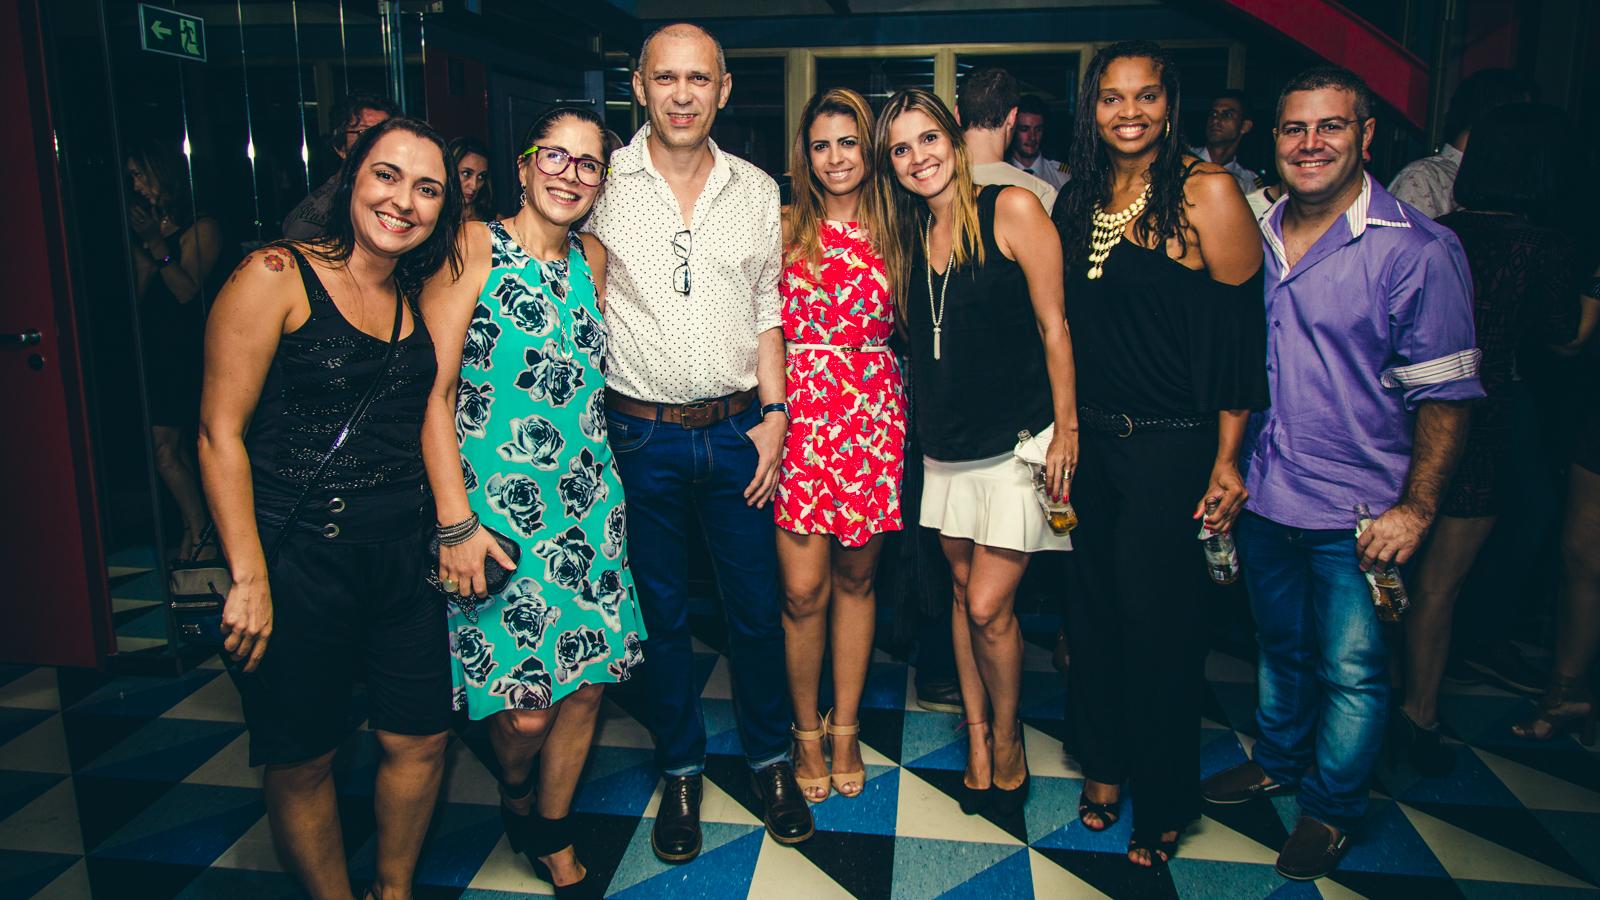 Flavia Marangoni, Isabel Borba, Aloísio Farias, Rejane Thomáz, Carol Wehba, Paula Vanessa e Alexandre Costa